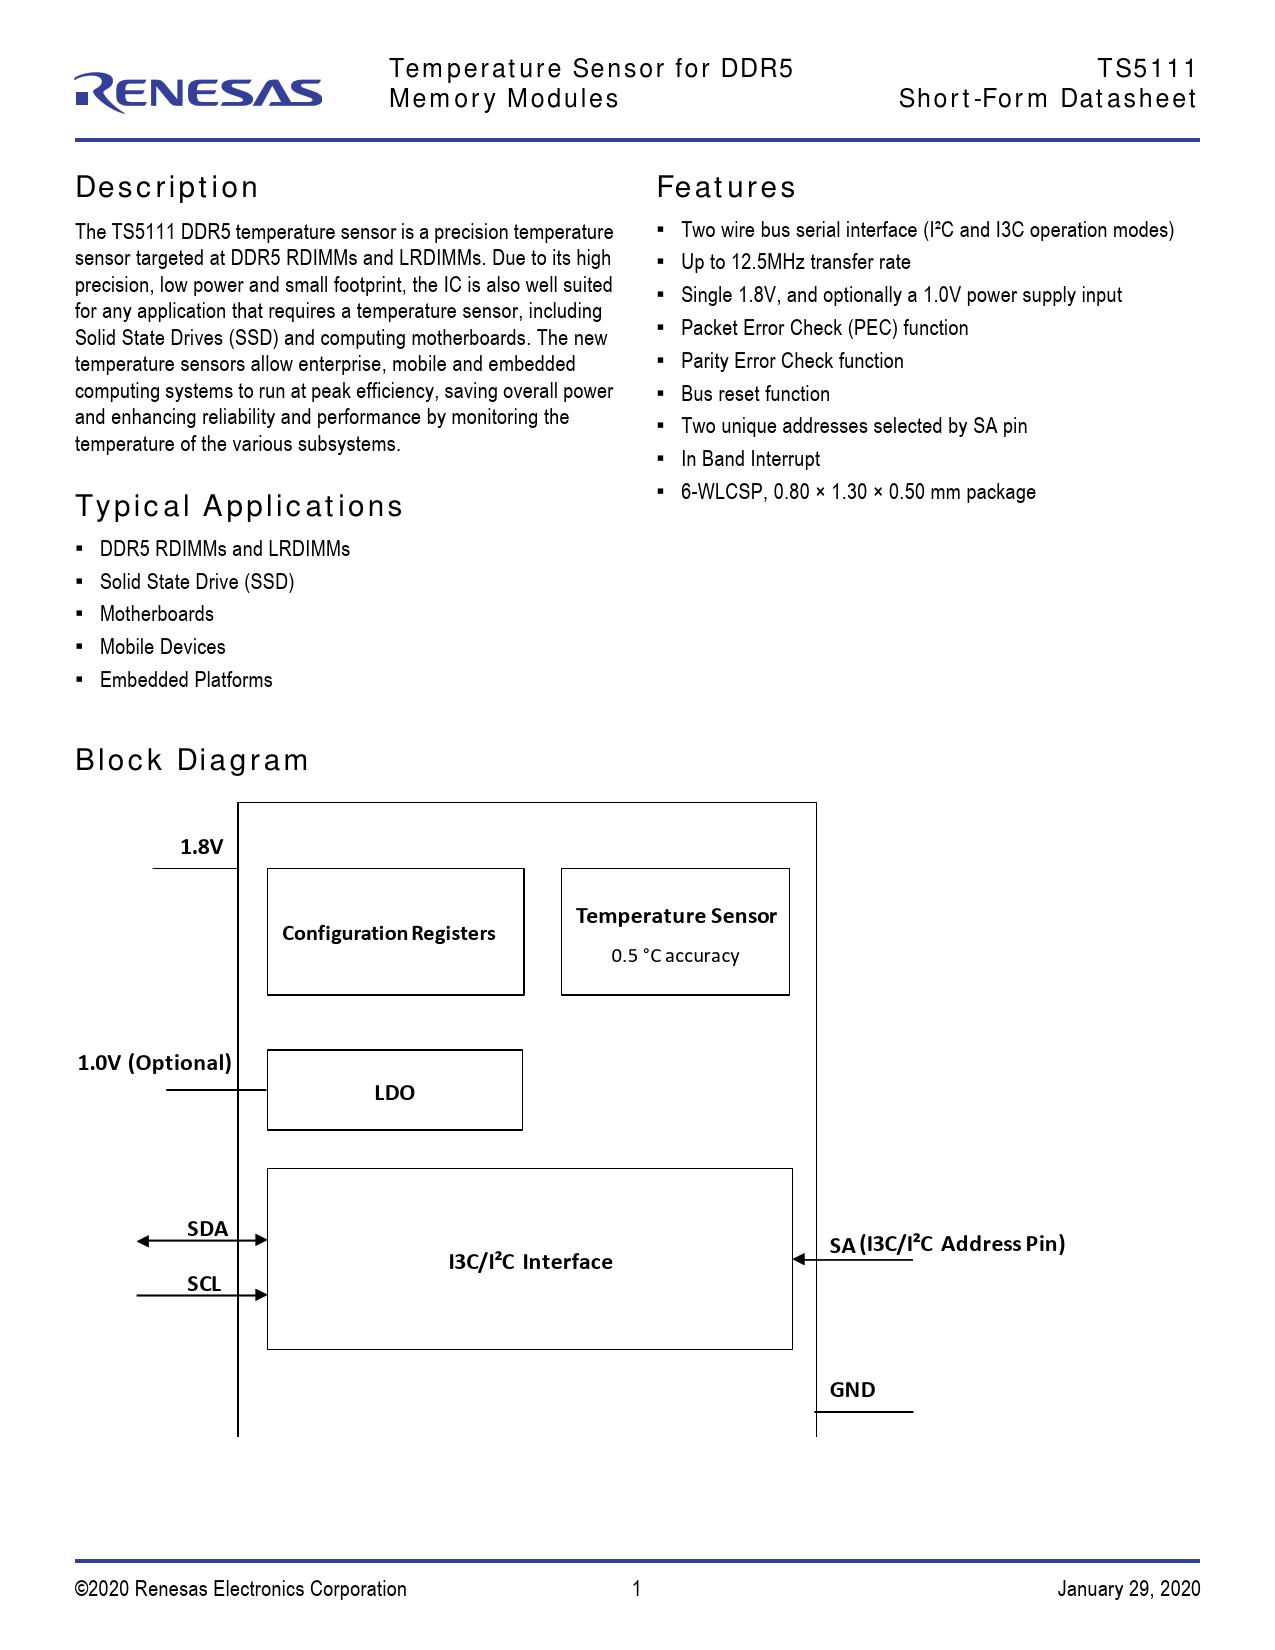 Short Form Datasheet TS5111 IDT, Версия: 20200129